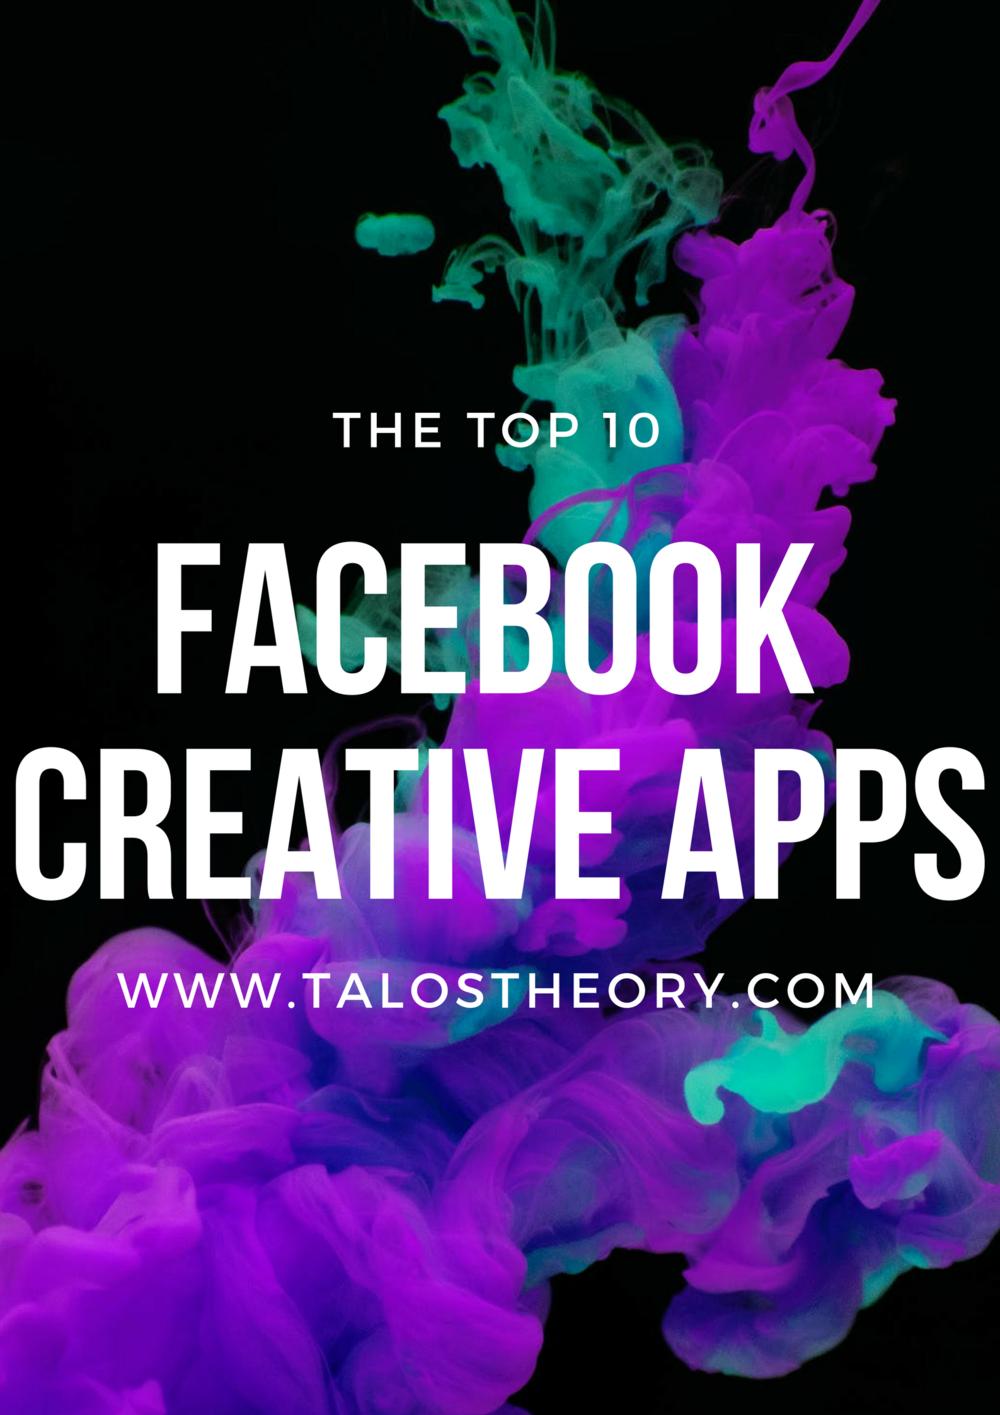 Facebook's Top 10 Creative Apps